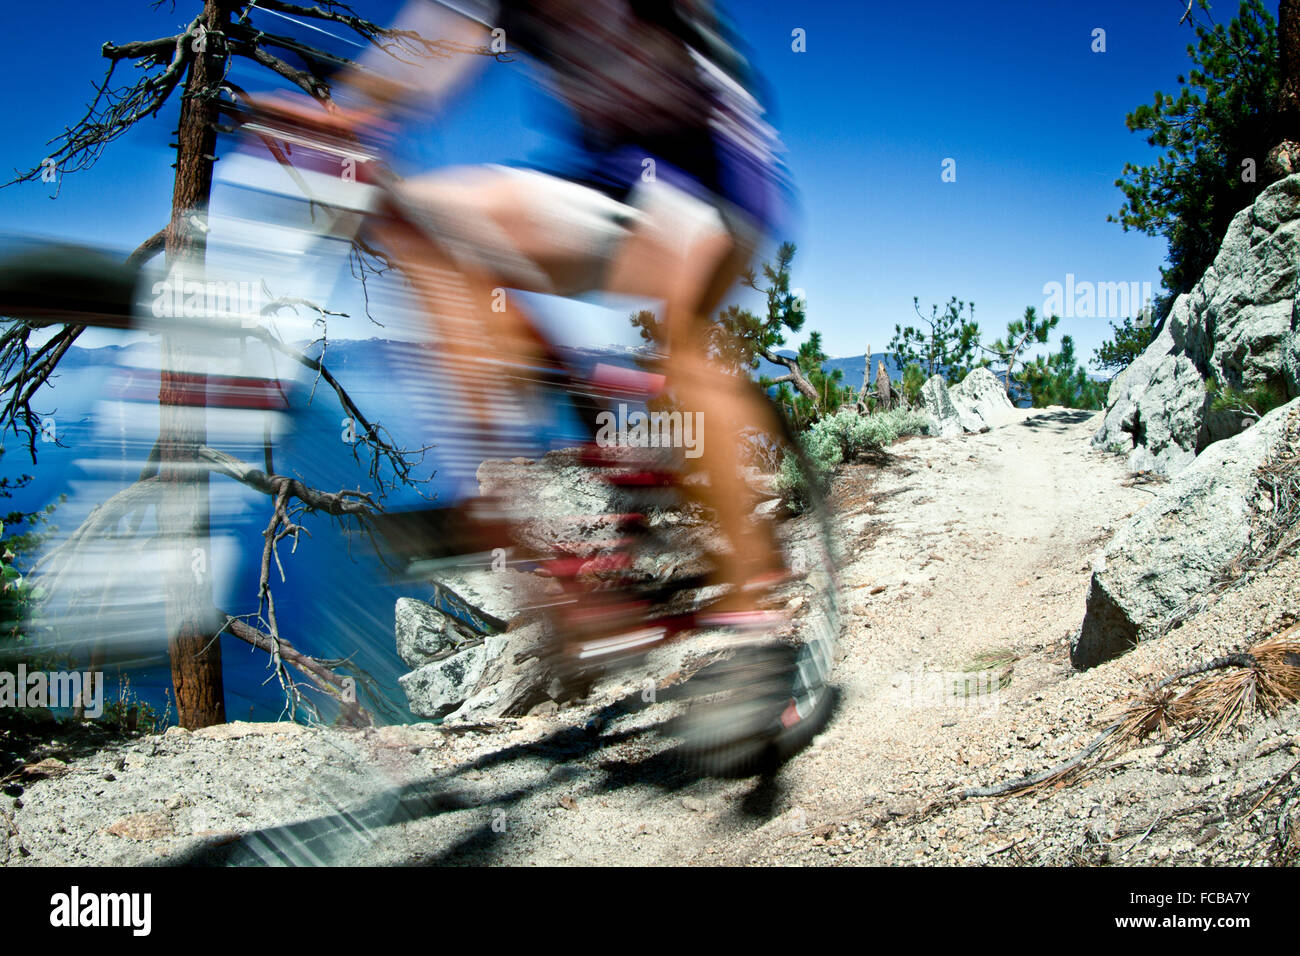 Mountain Biking on Flume Trail, Tahoe, CA - Stock Image